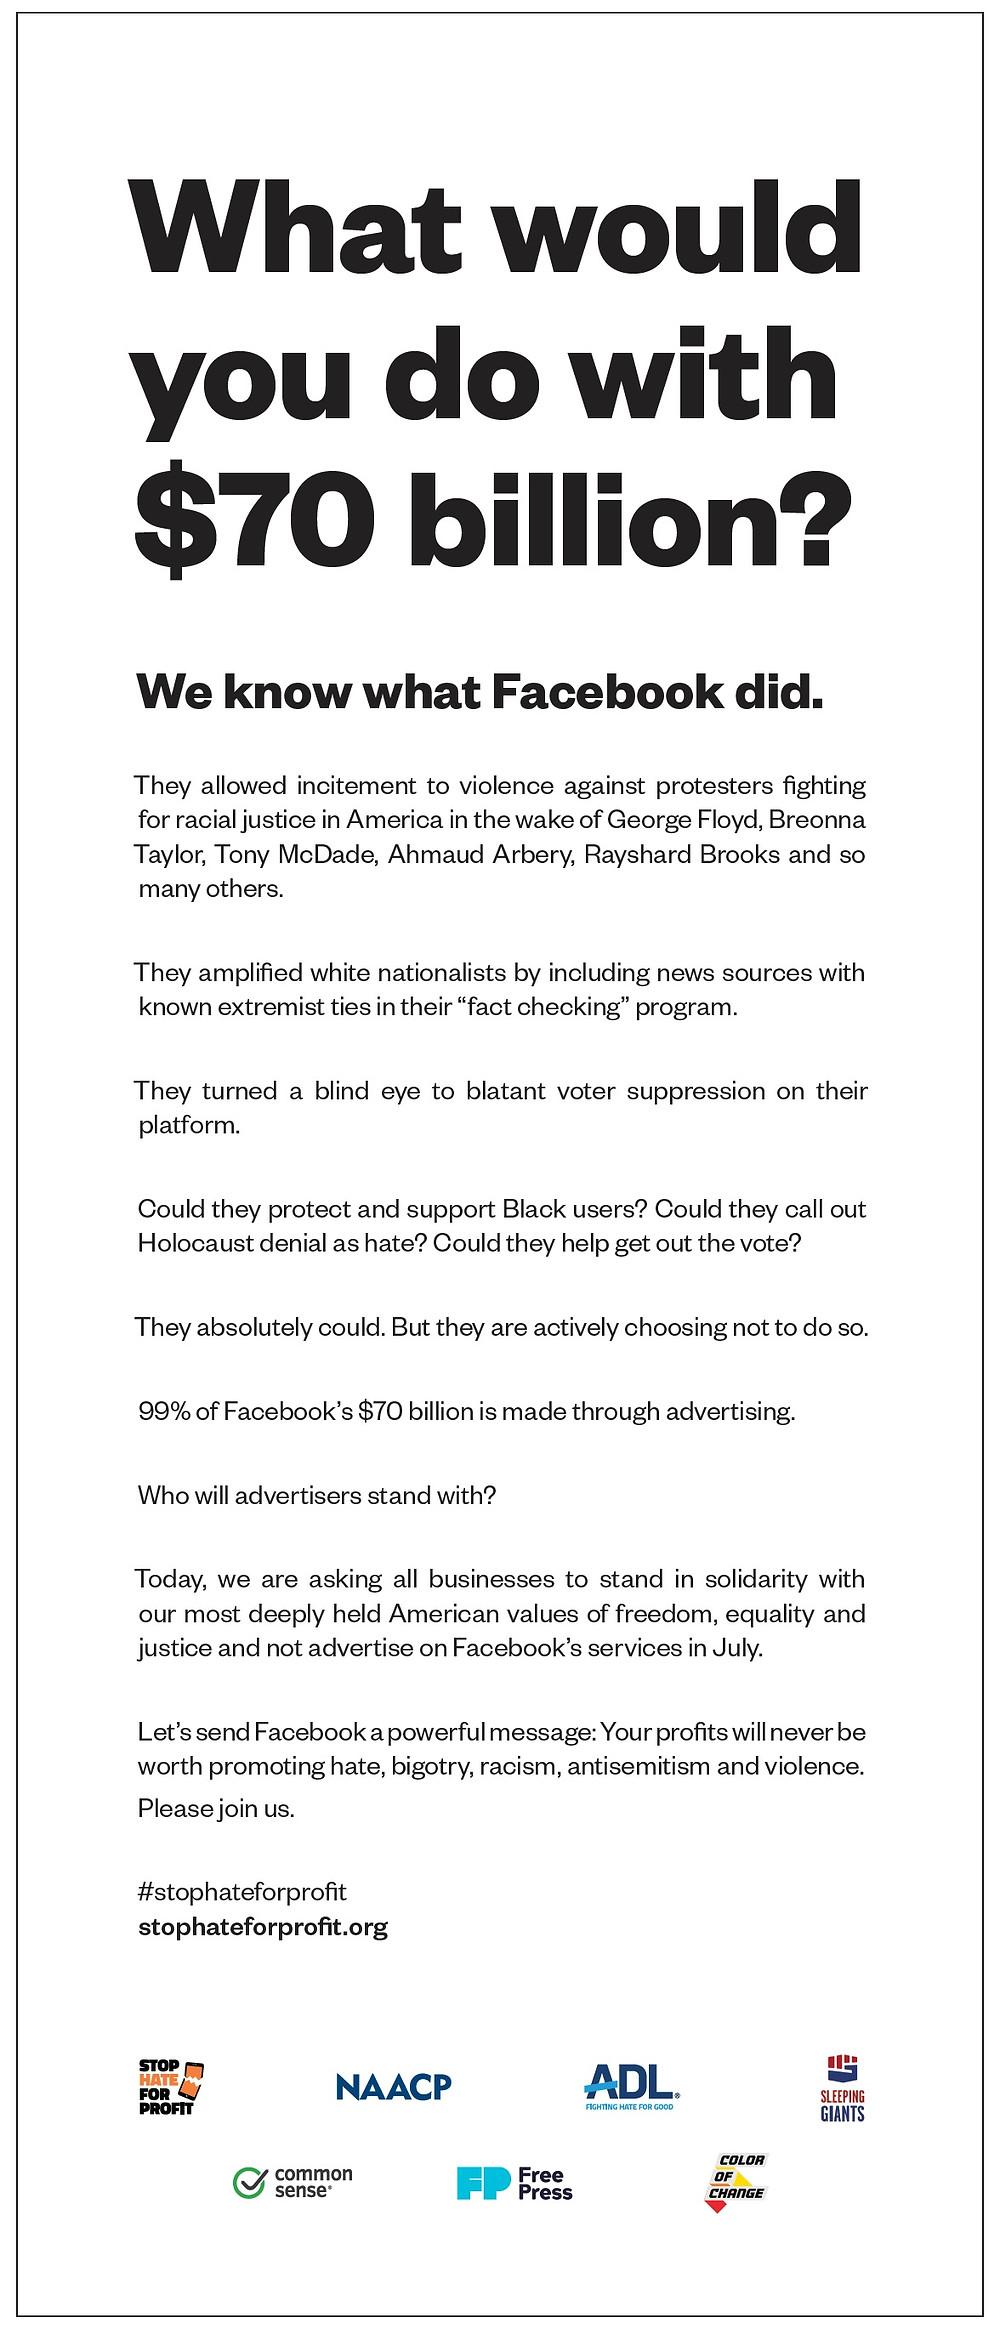 #stophateforprofit: don't advertise on Facebook